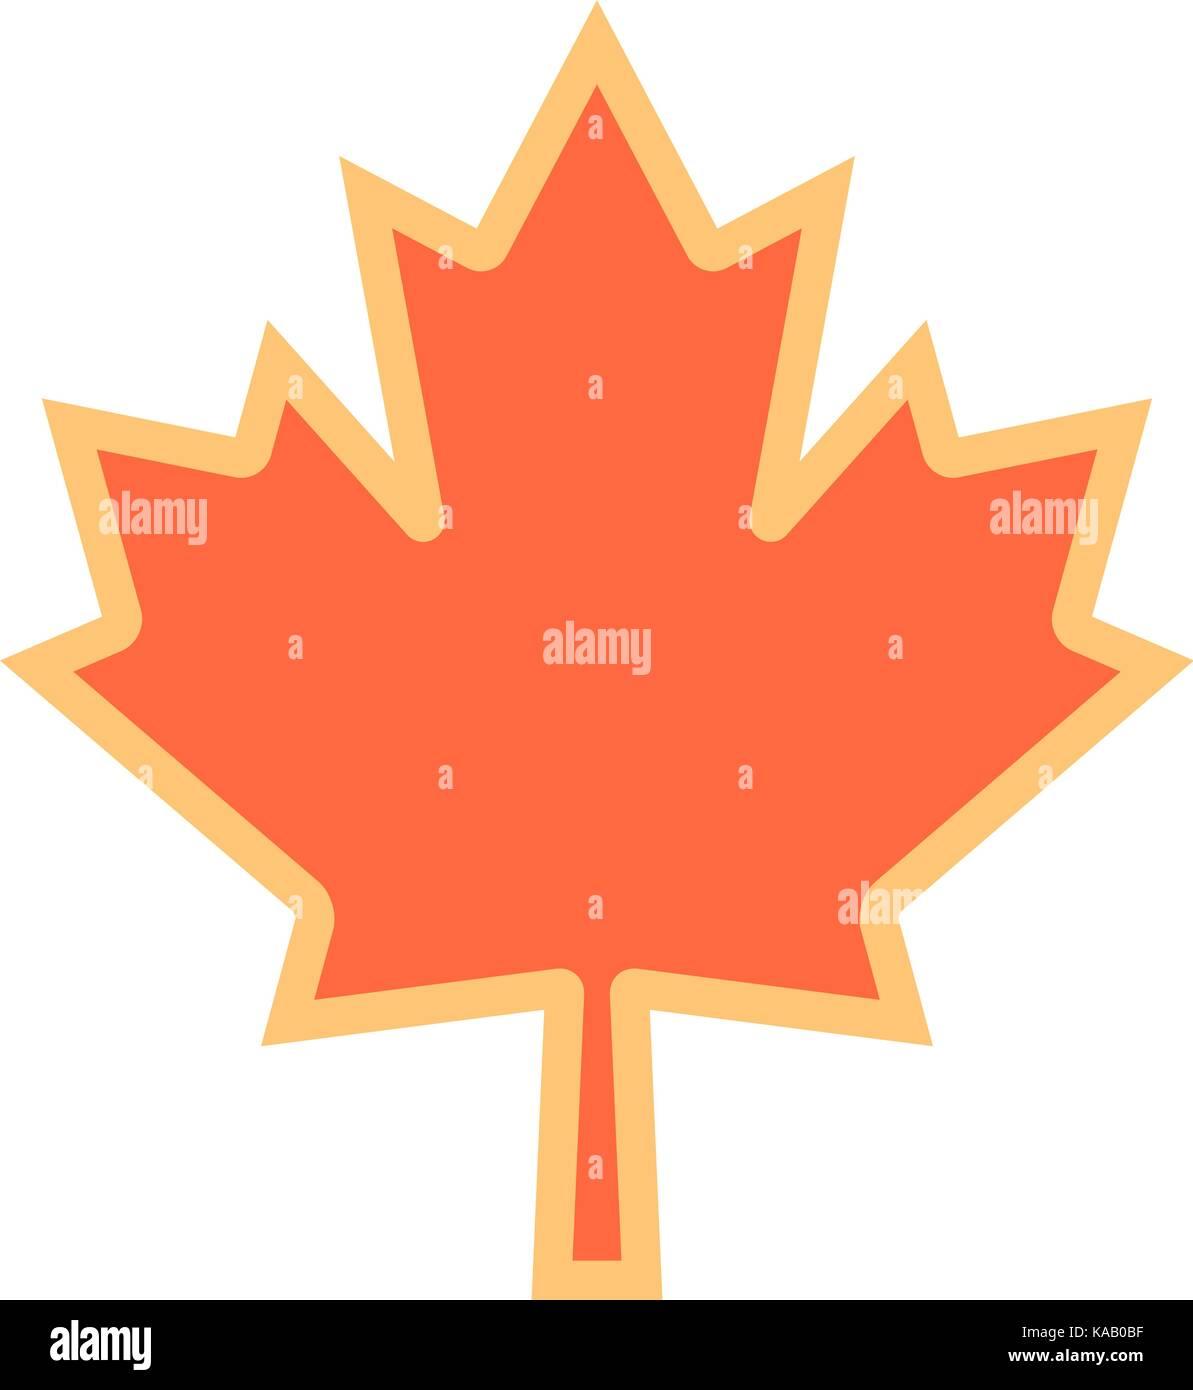 Canadian flag stock vector images alamy canadian maple leaf symbol national flag of canada buycottarizona